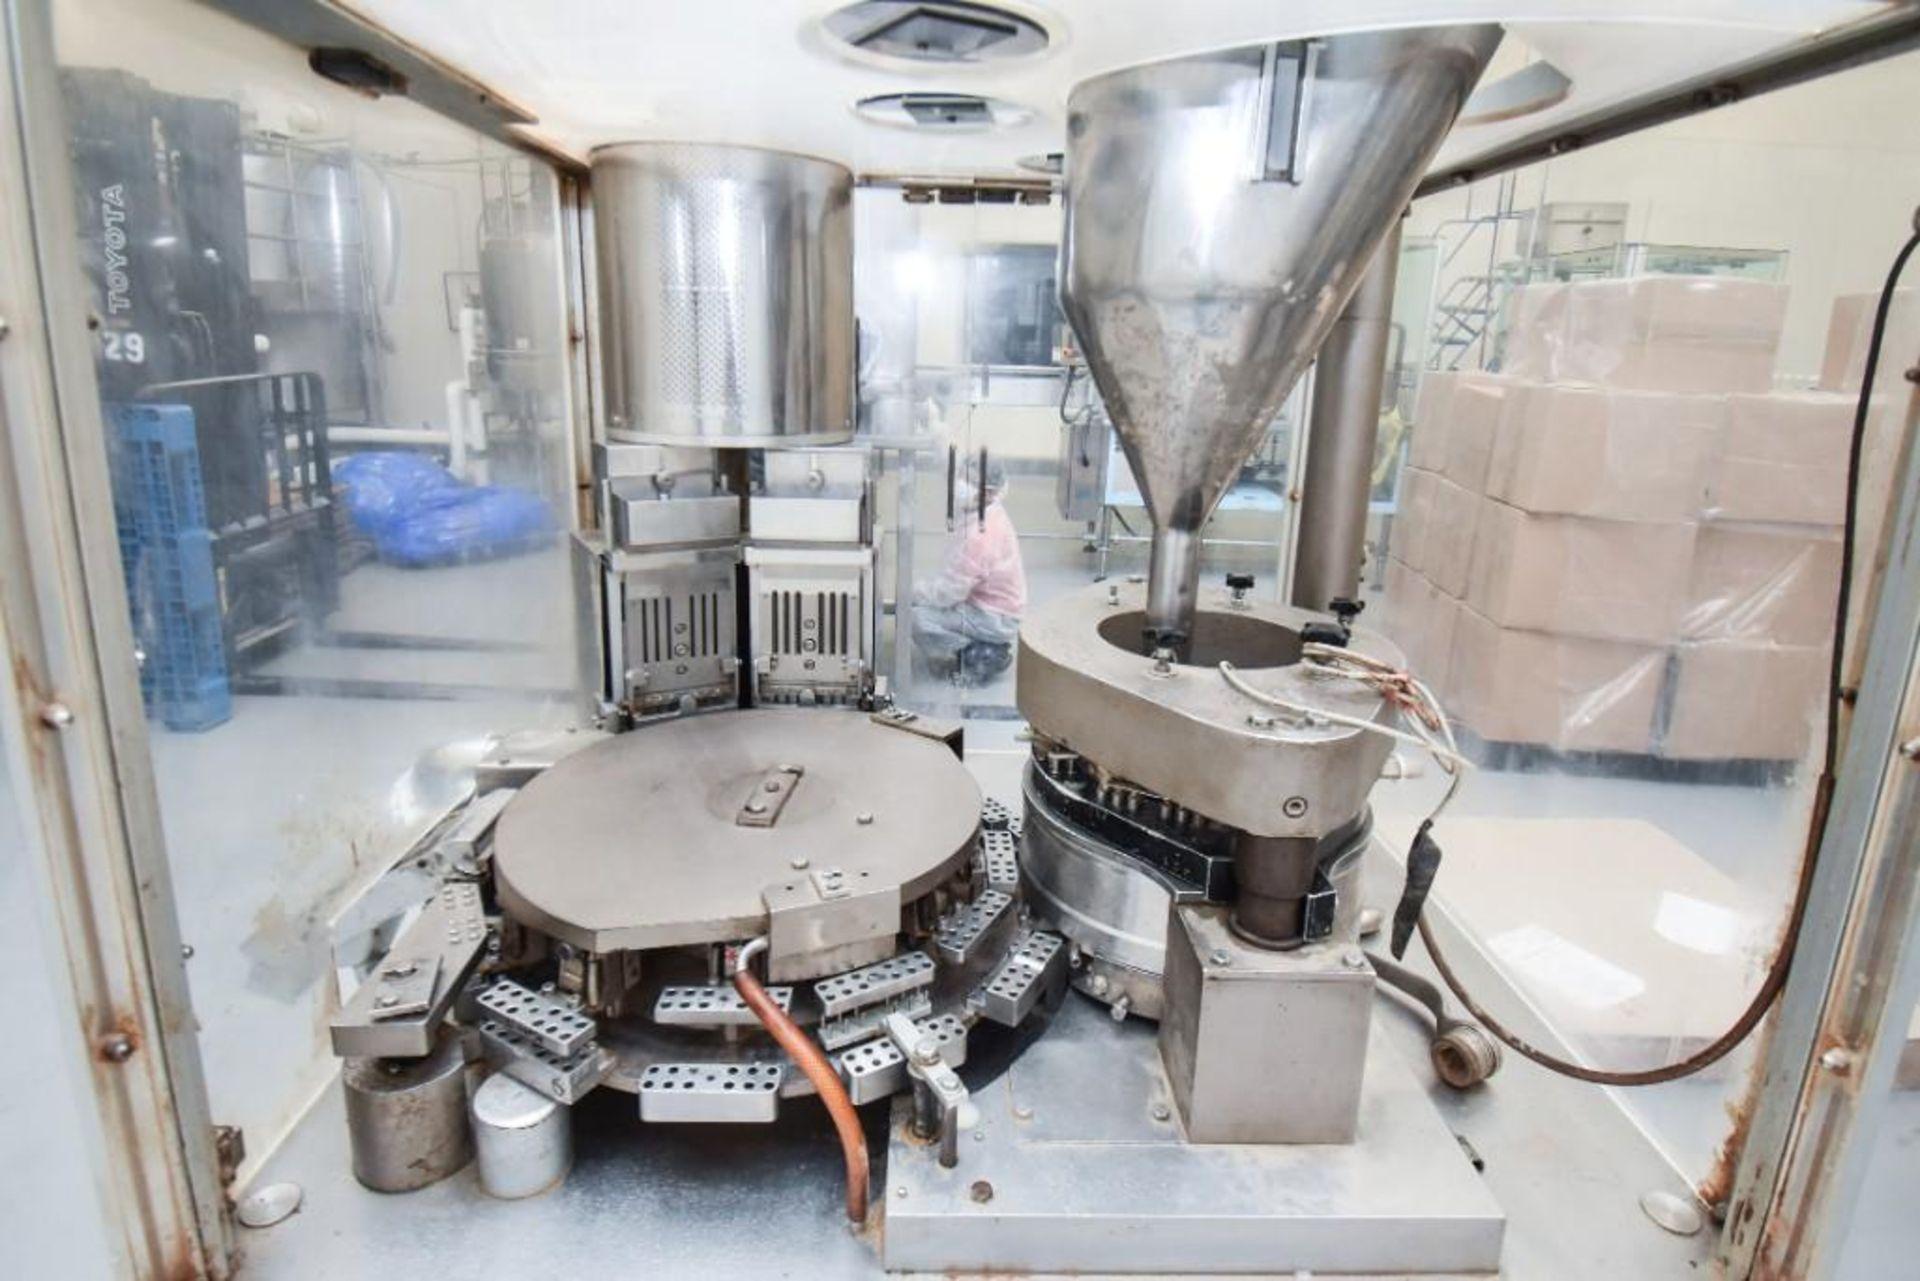 GFK 1500 Bosch Encapsulation Machine - Image 2 of 11